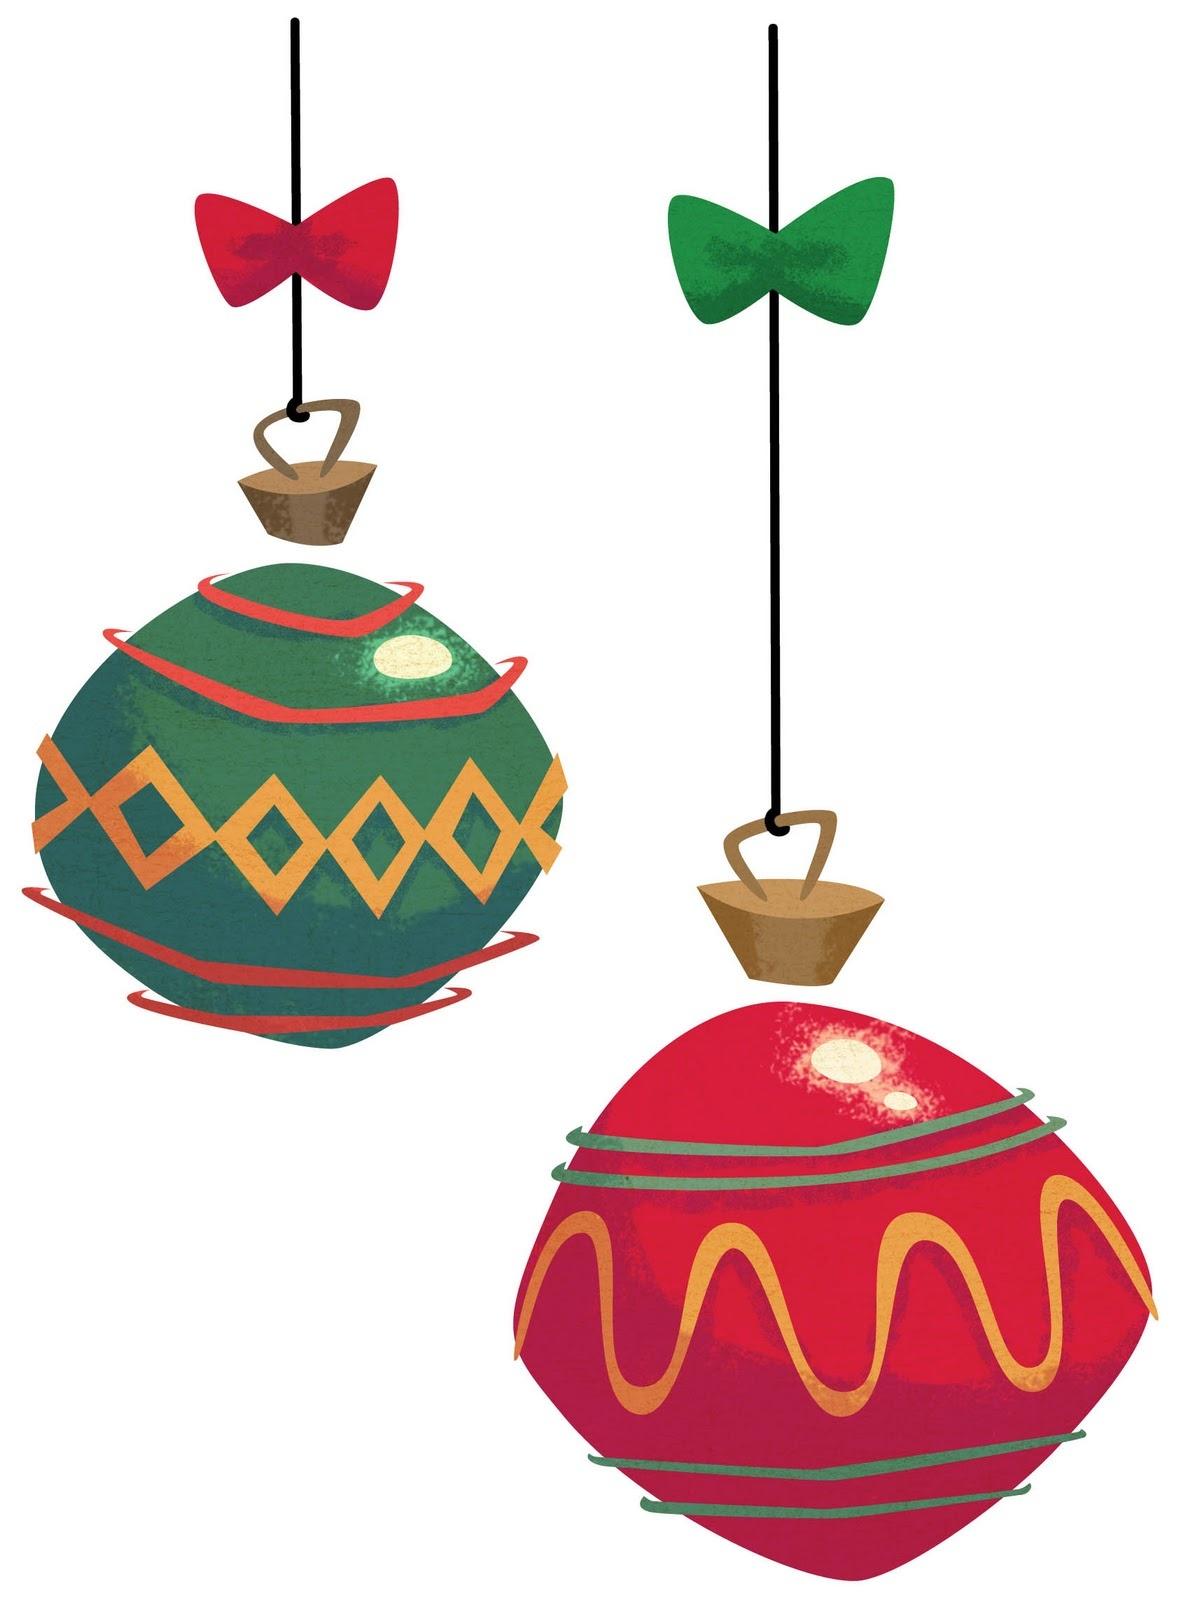 Free Free Christmas Art, Download Free Clip Art, Free Clip Art On - Free Printable Vintage Christmas Clip Art